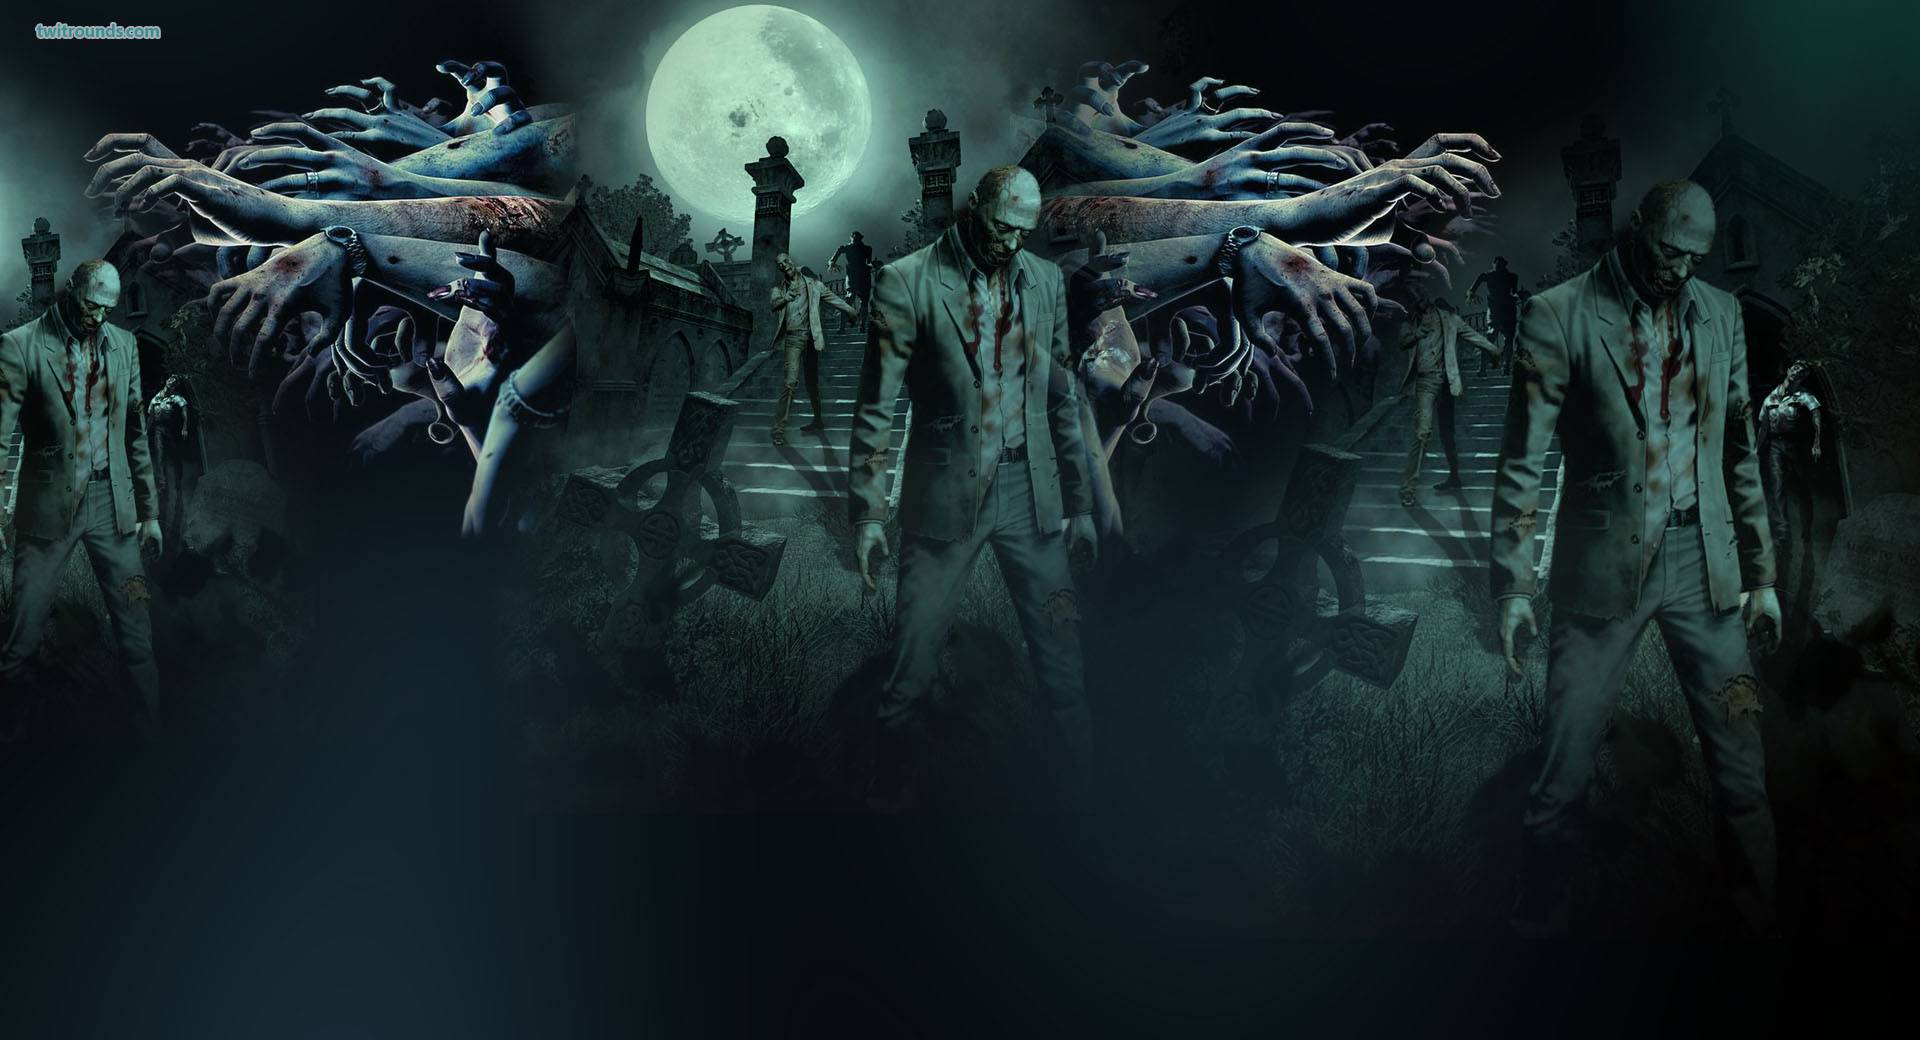 Resident Evil 2 Wallpaper: Resident Evil 2 Wallpapers